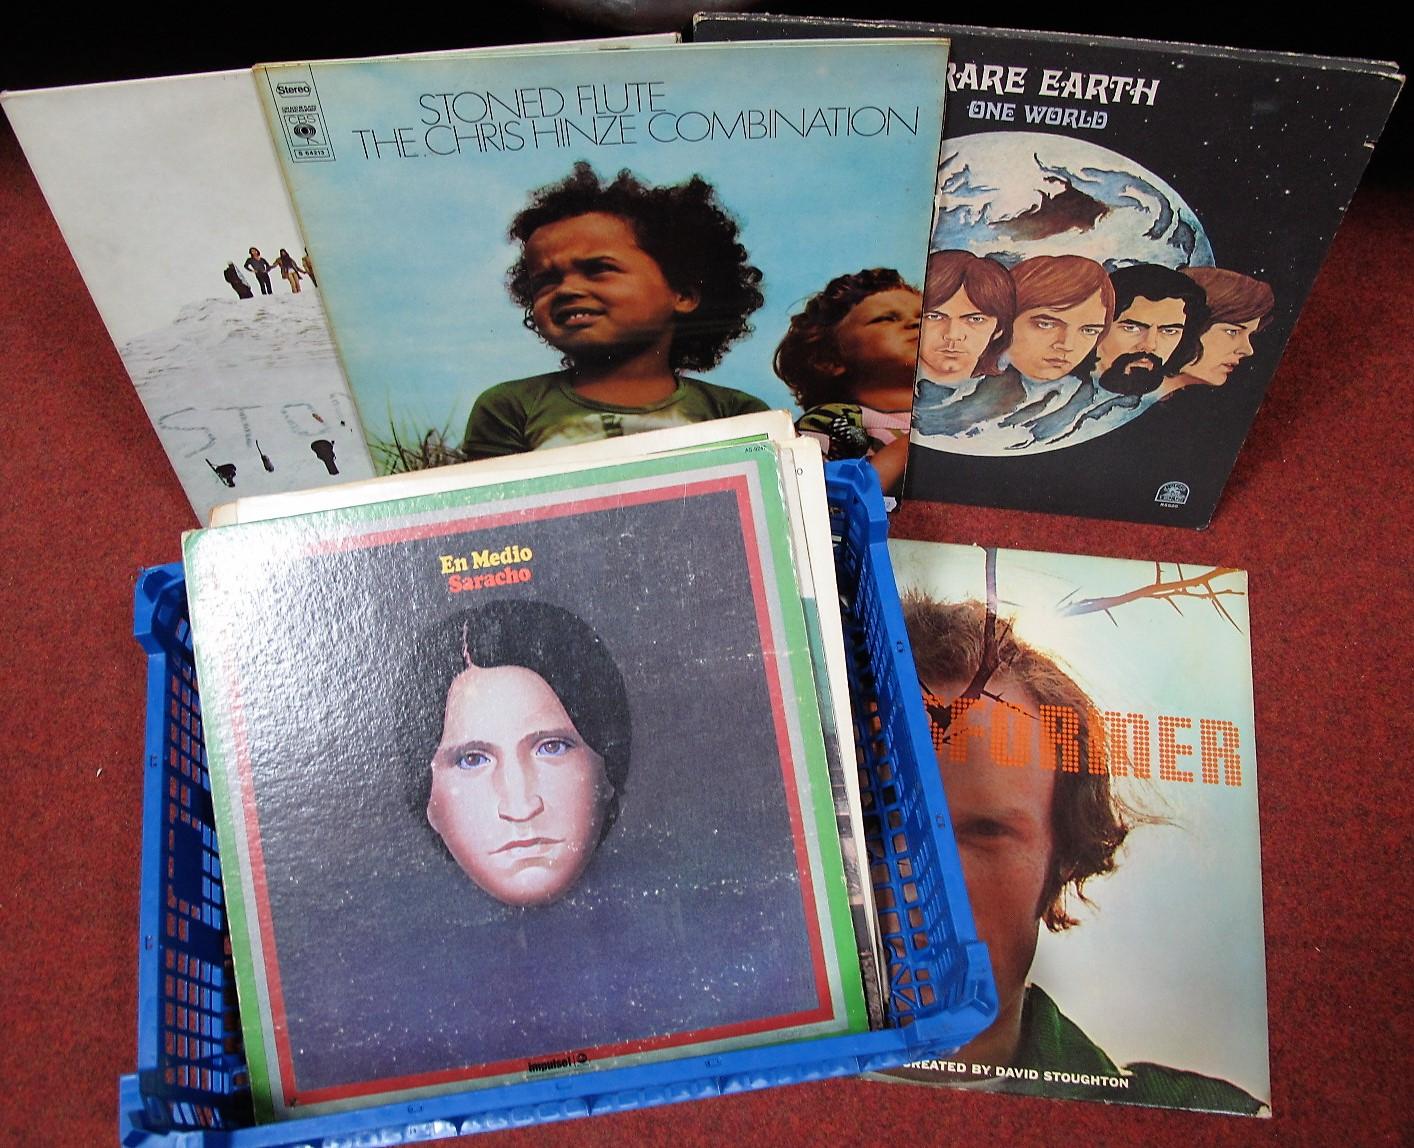 Lot 650 - Prog/Rock/Funk - Charisma 'Disturbance' two LP compliation v/a; The Chris Hinze Combination '